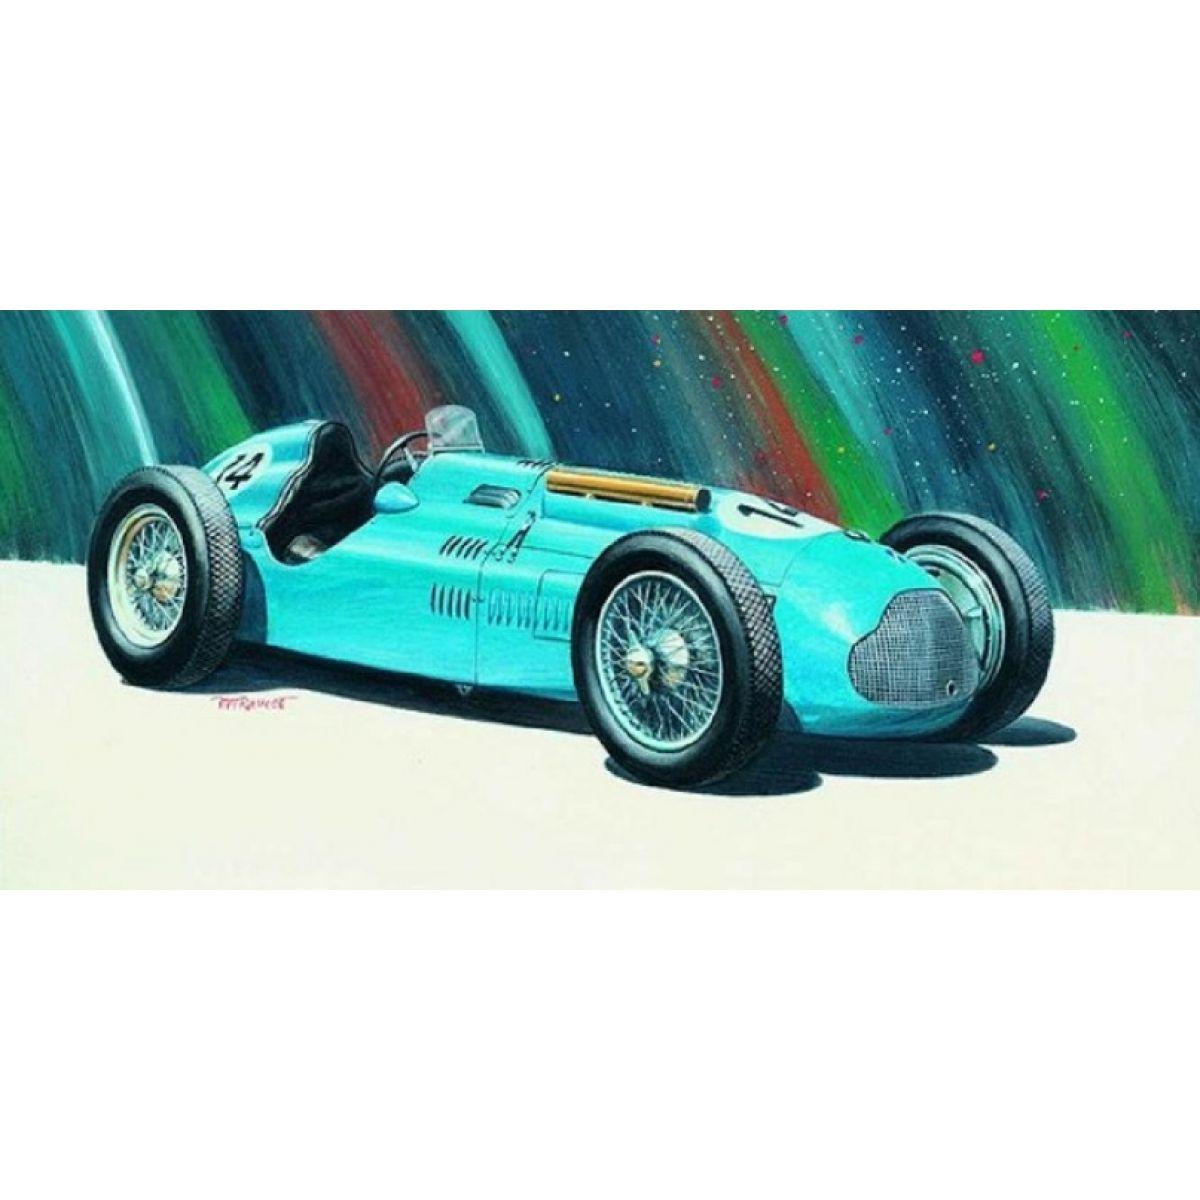 Směr Talbot Lago Grand Prix 1949 1:24